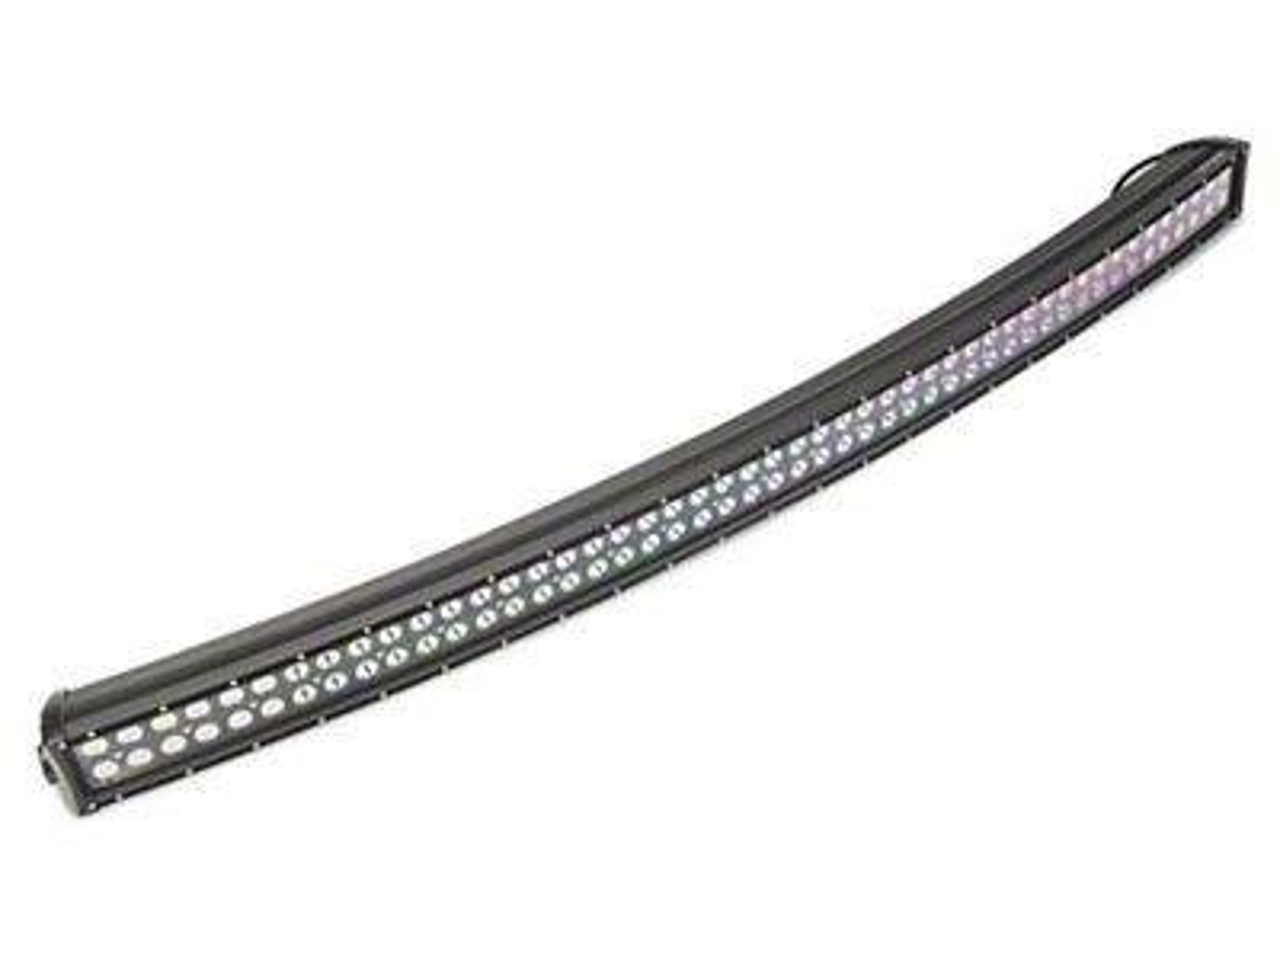 Raxiom 50 in. Dual Row LED Light Bar w/ Roof Mounting Brackets (14-15 Sierra 1500)